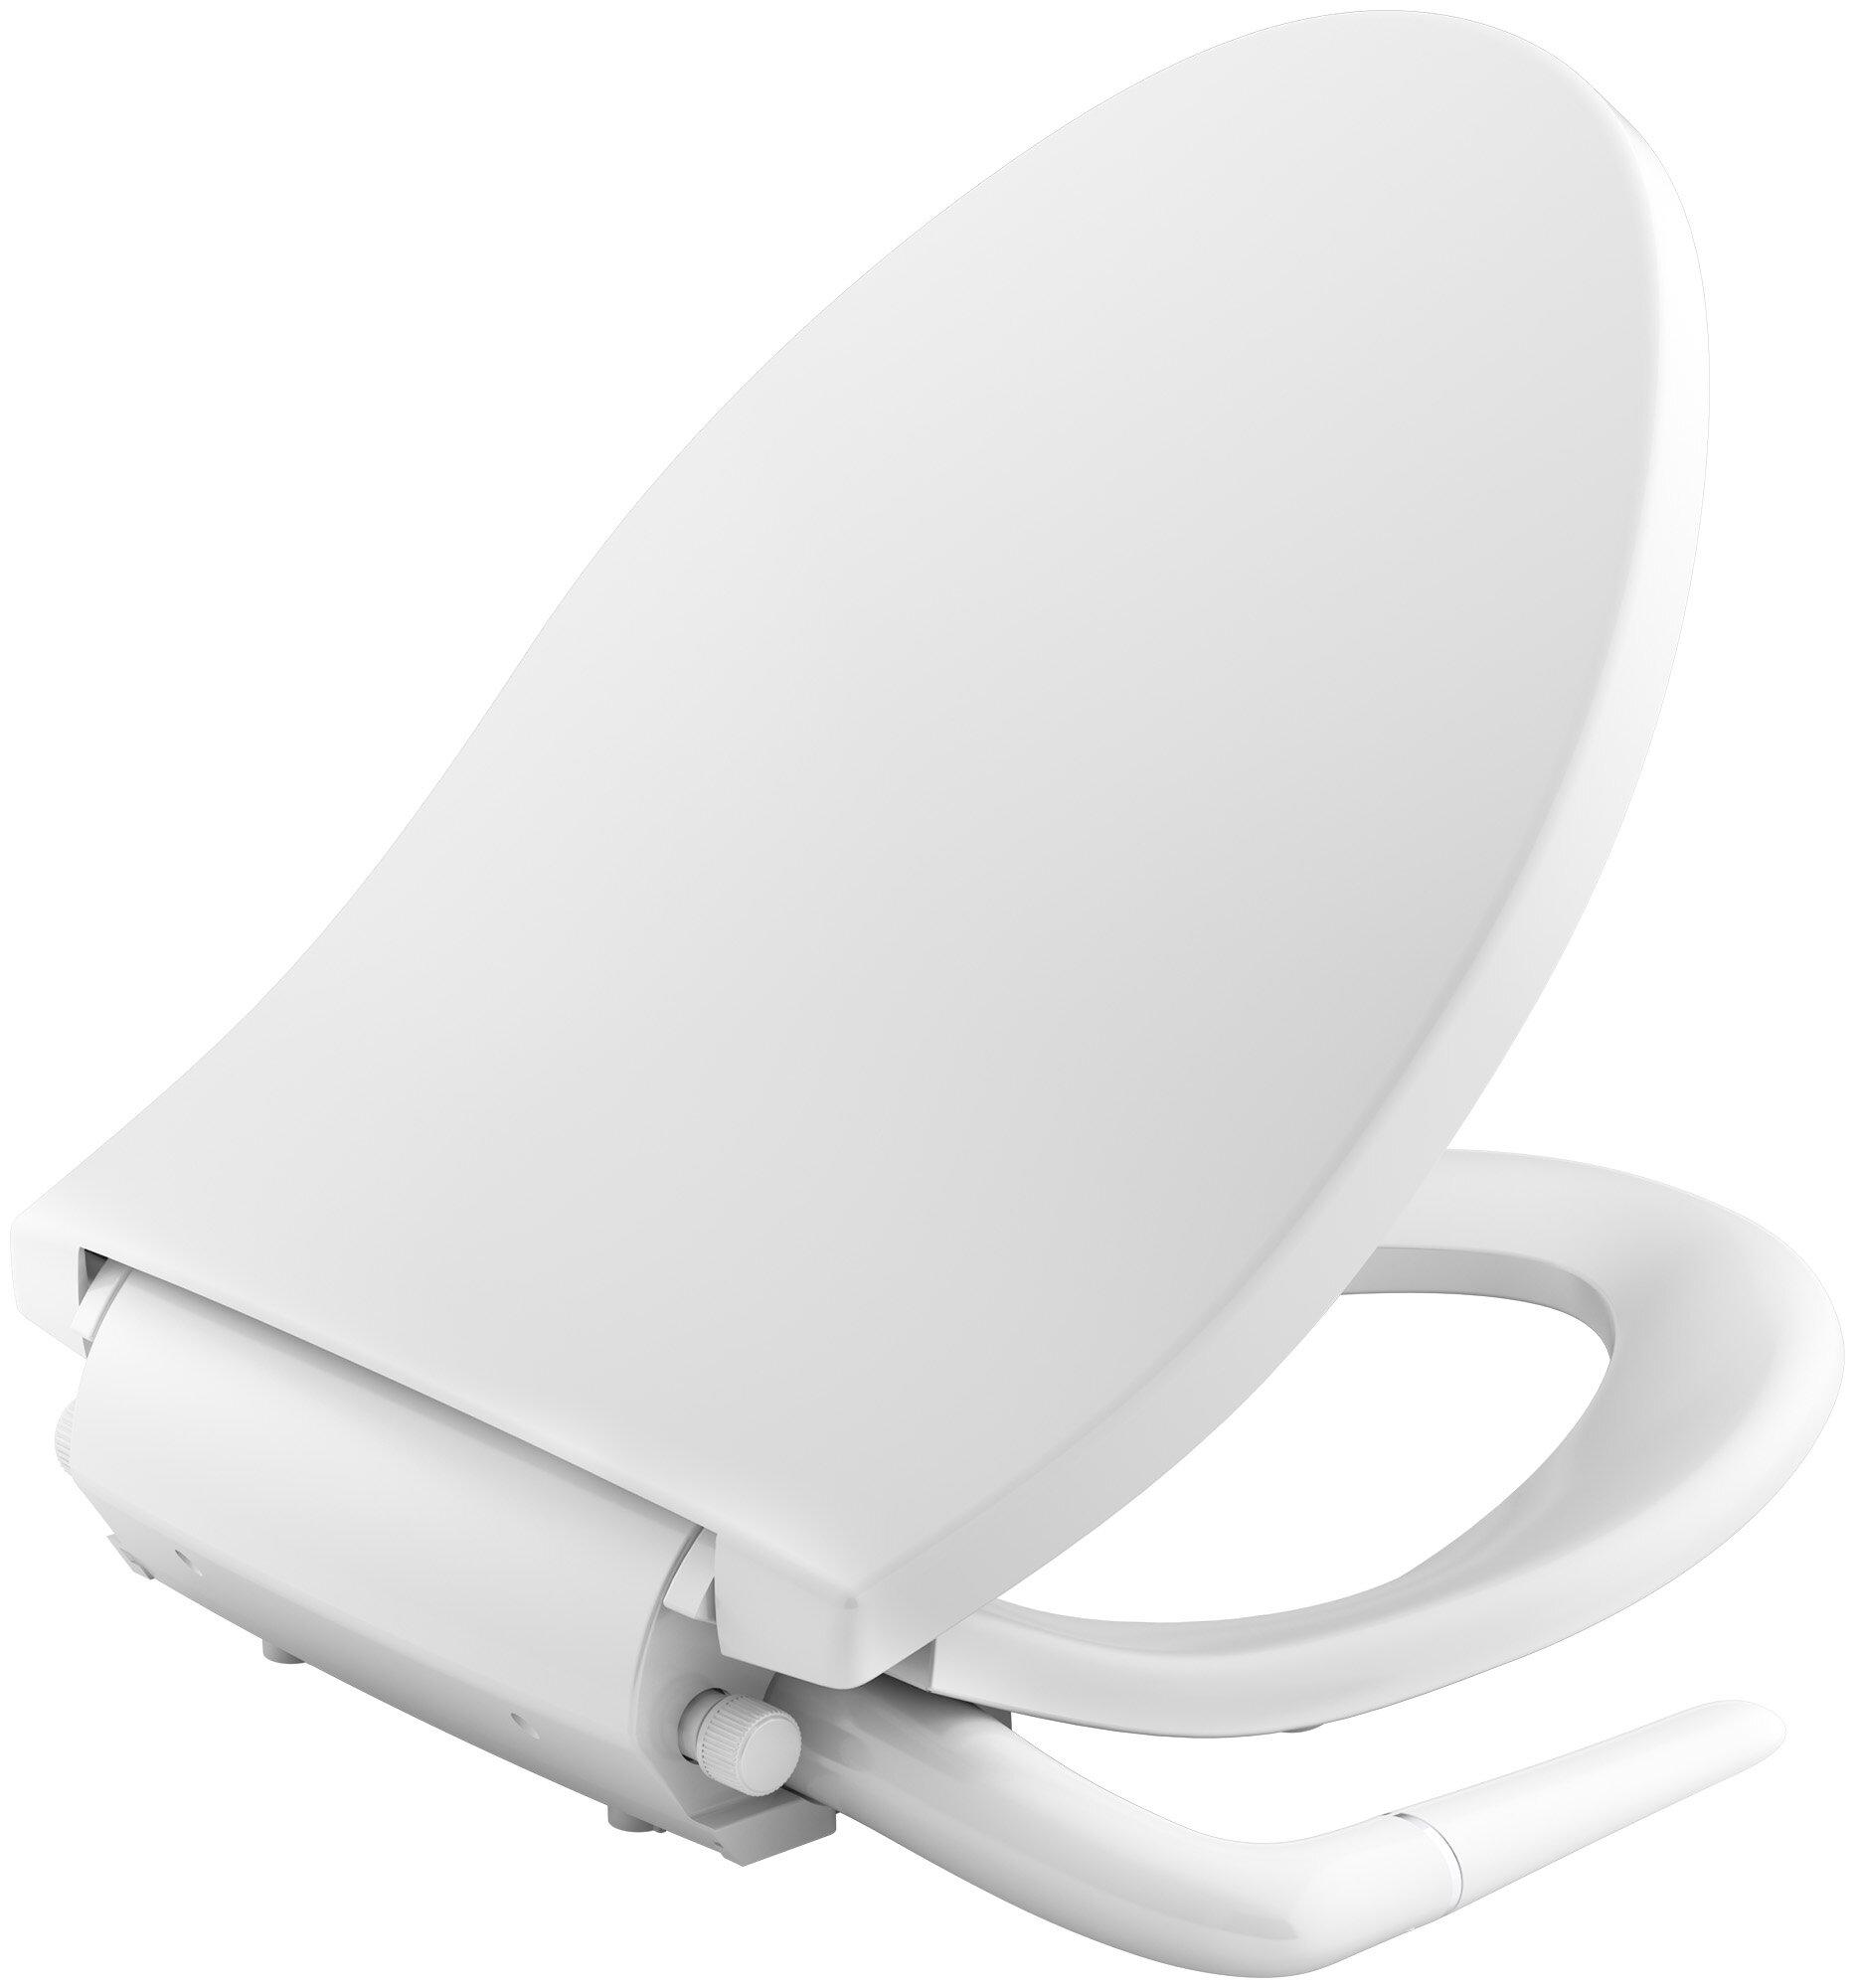 Astonishing Puretide Toilet Seat Bidet Elongated Bidet Seat Beatyapartments Chair Design Images Beatyapartmentscom